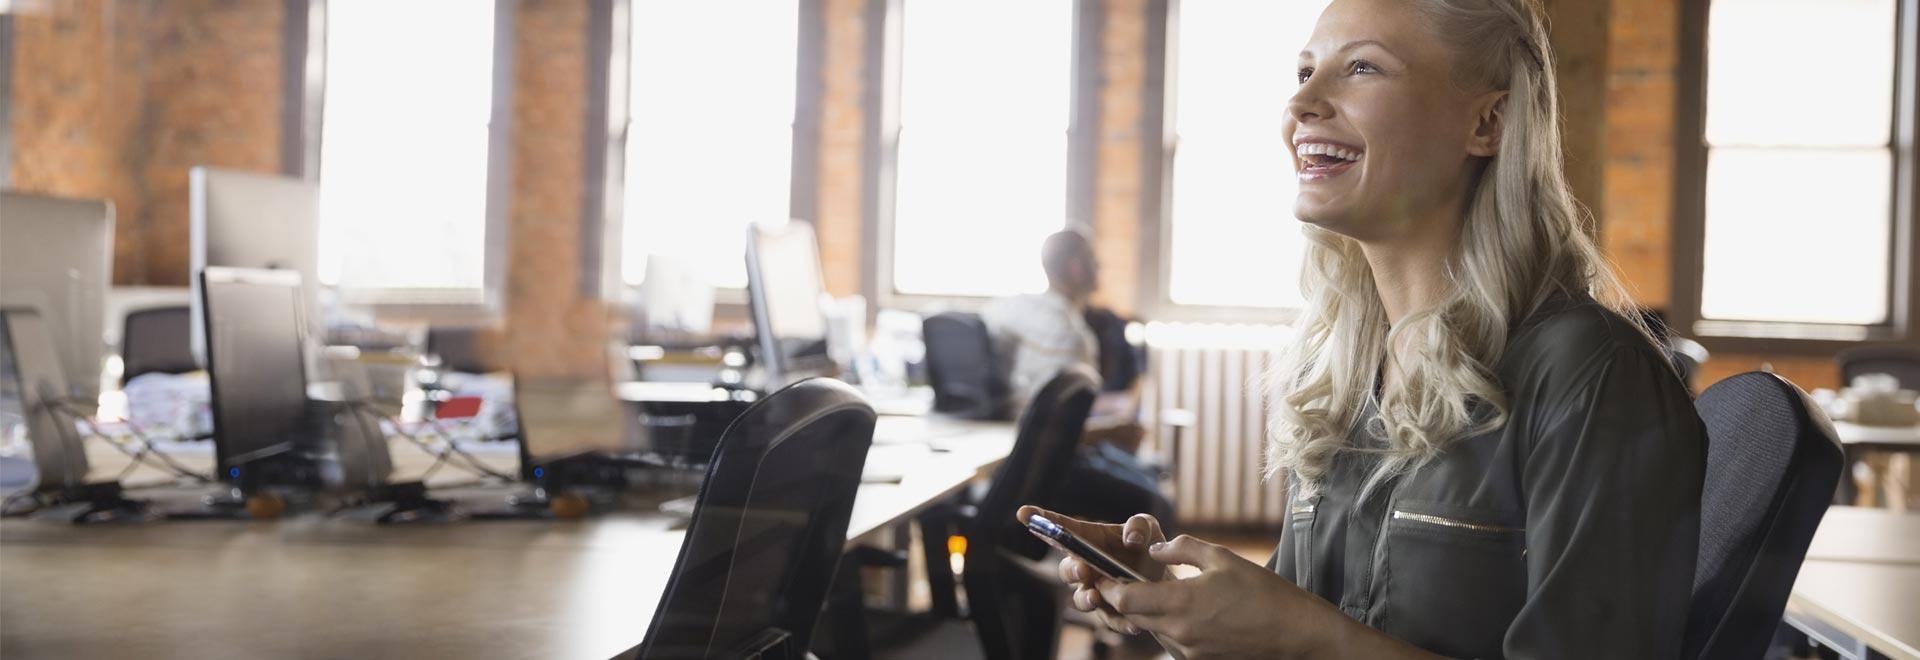 Office 365 Business Essentials